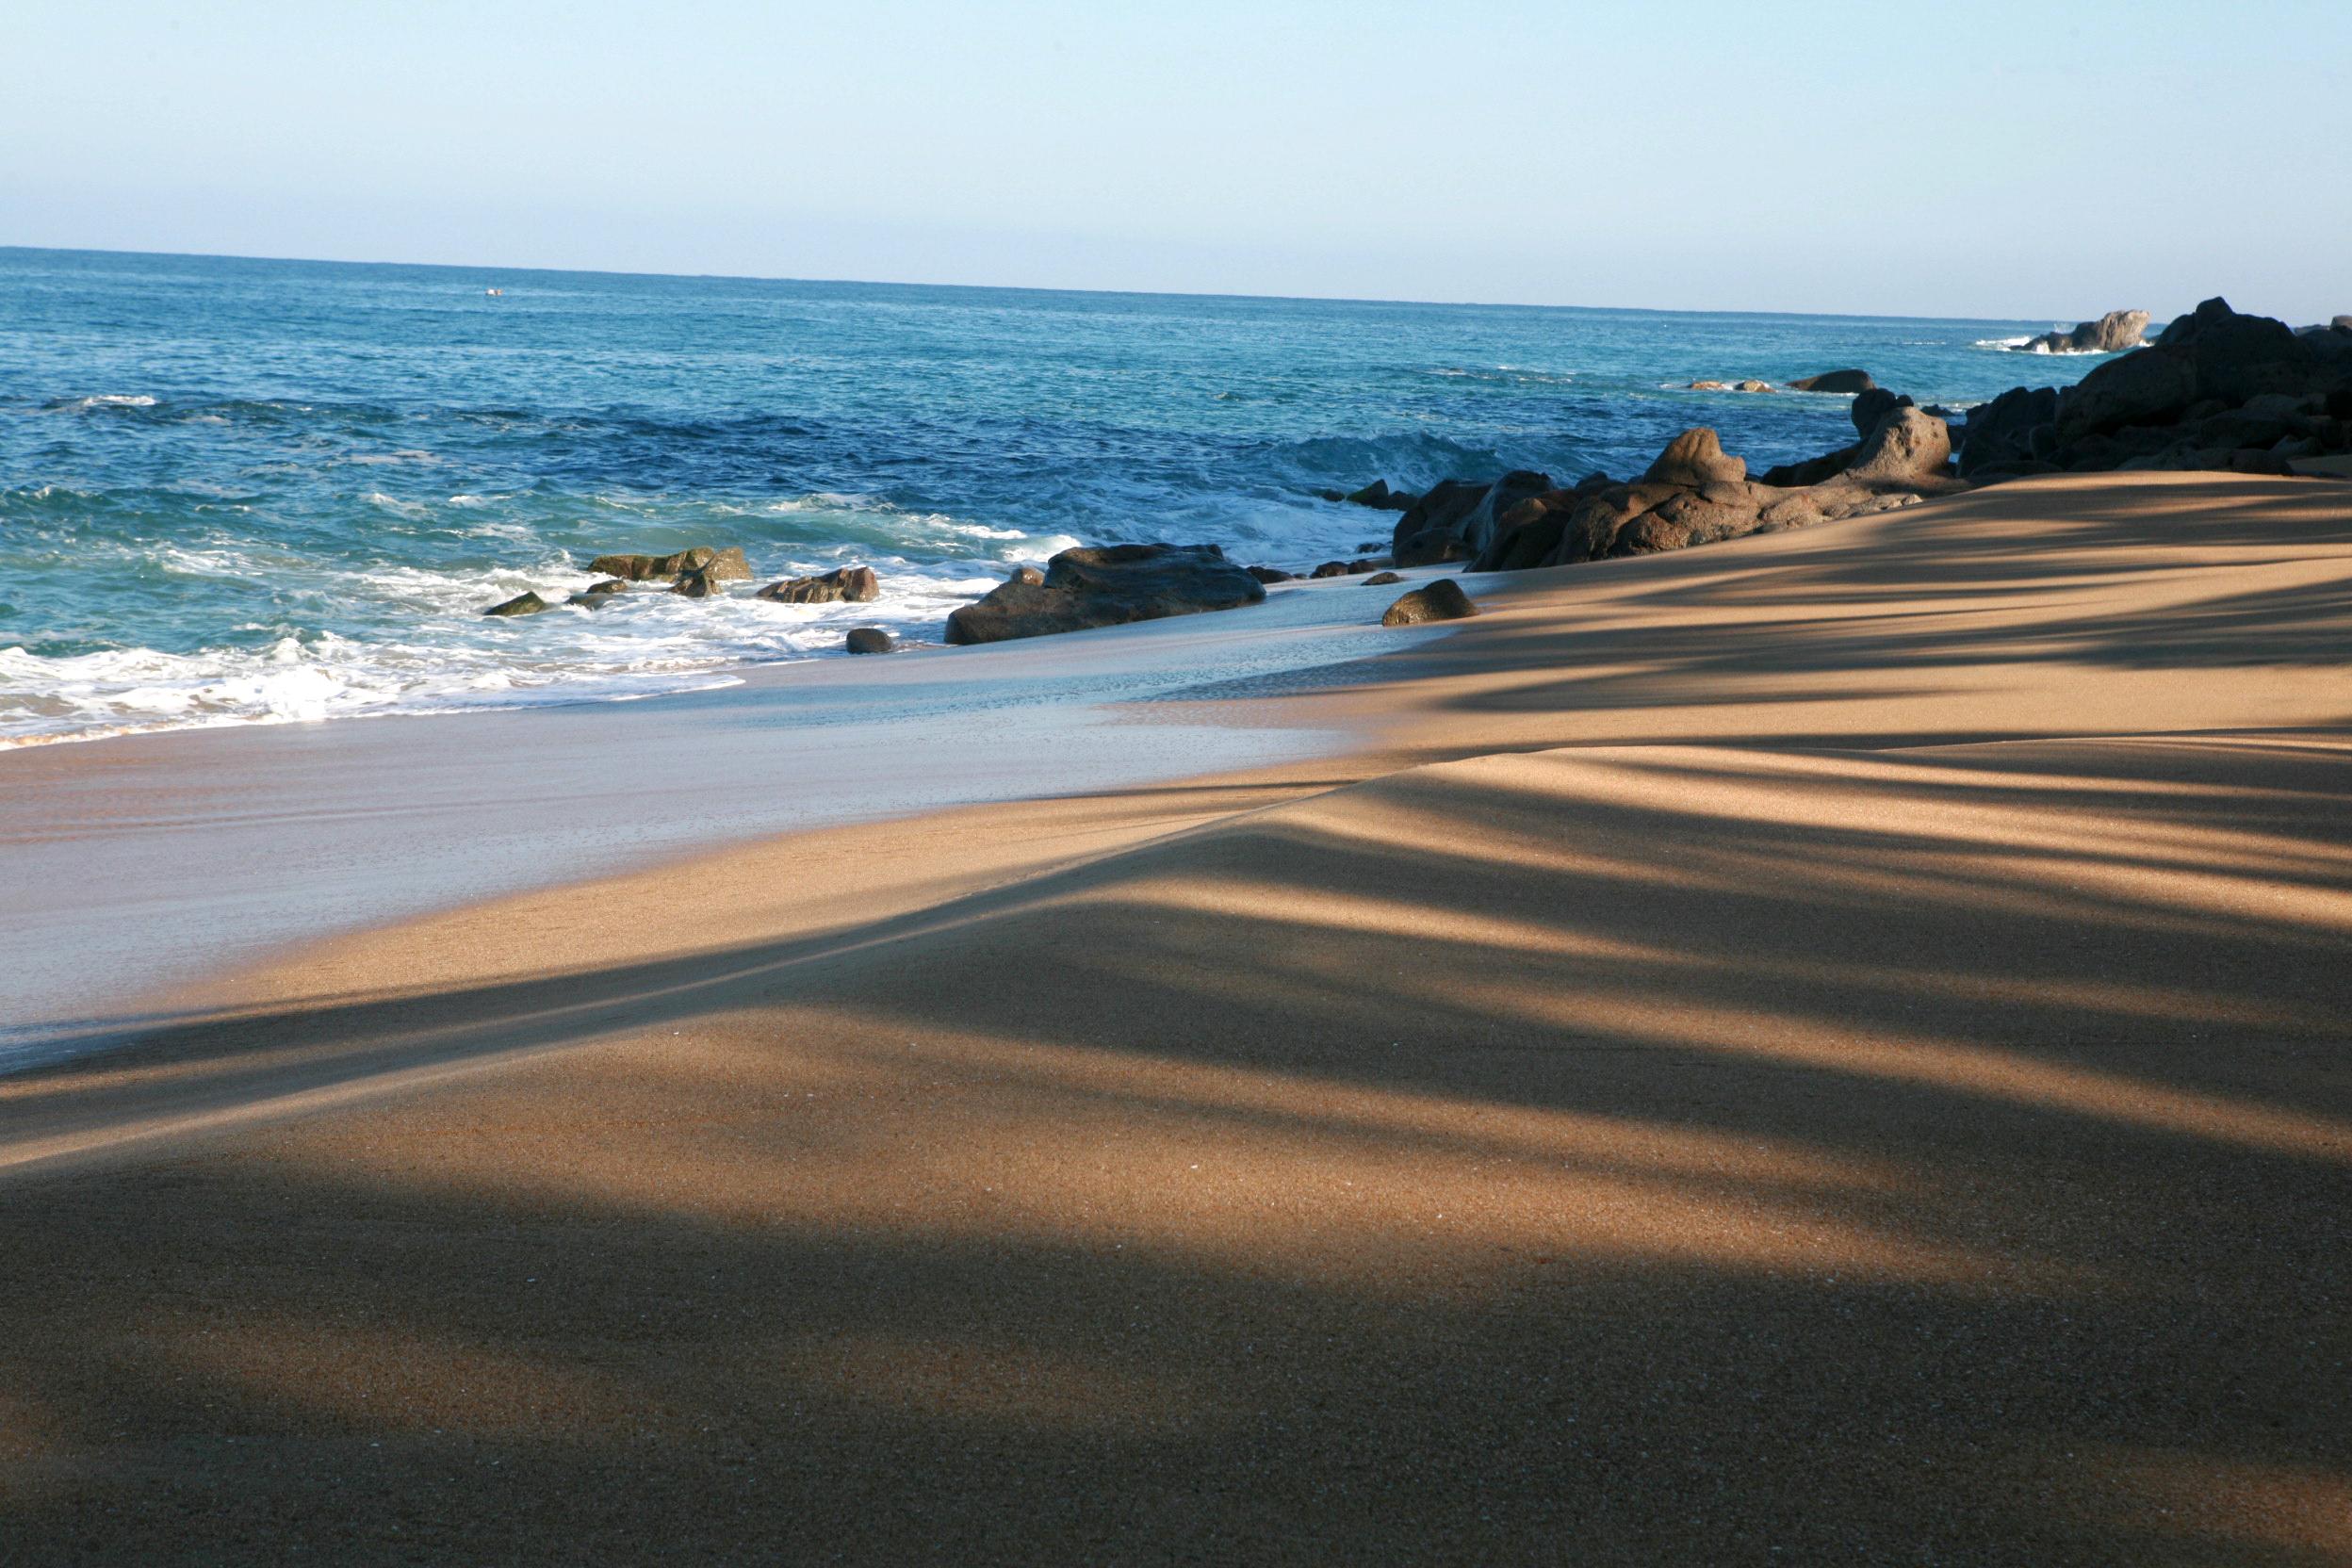 Haramara beach